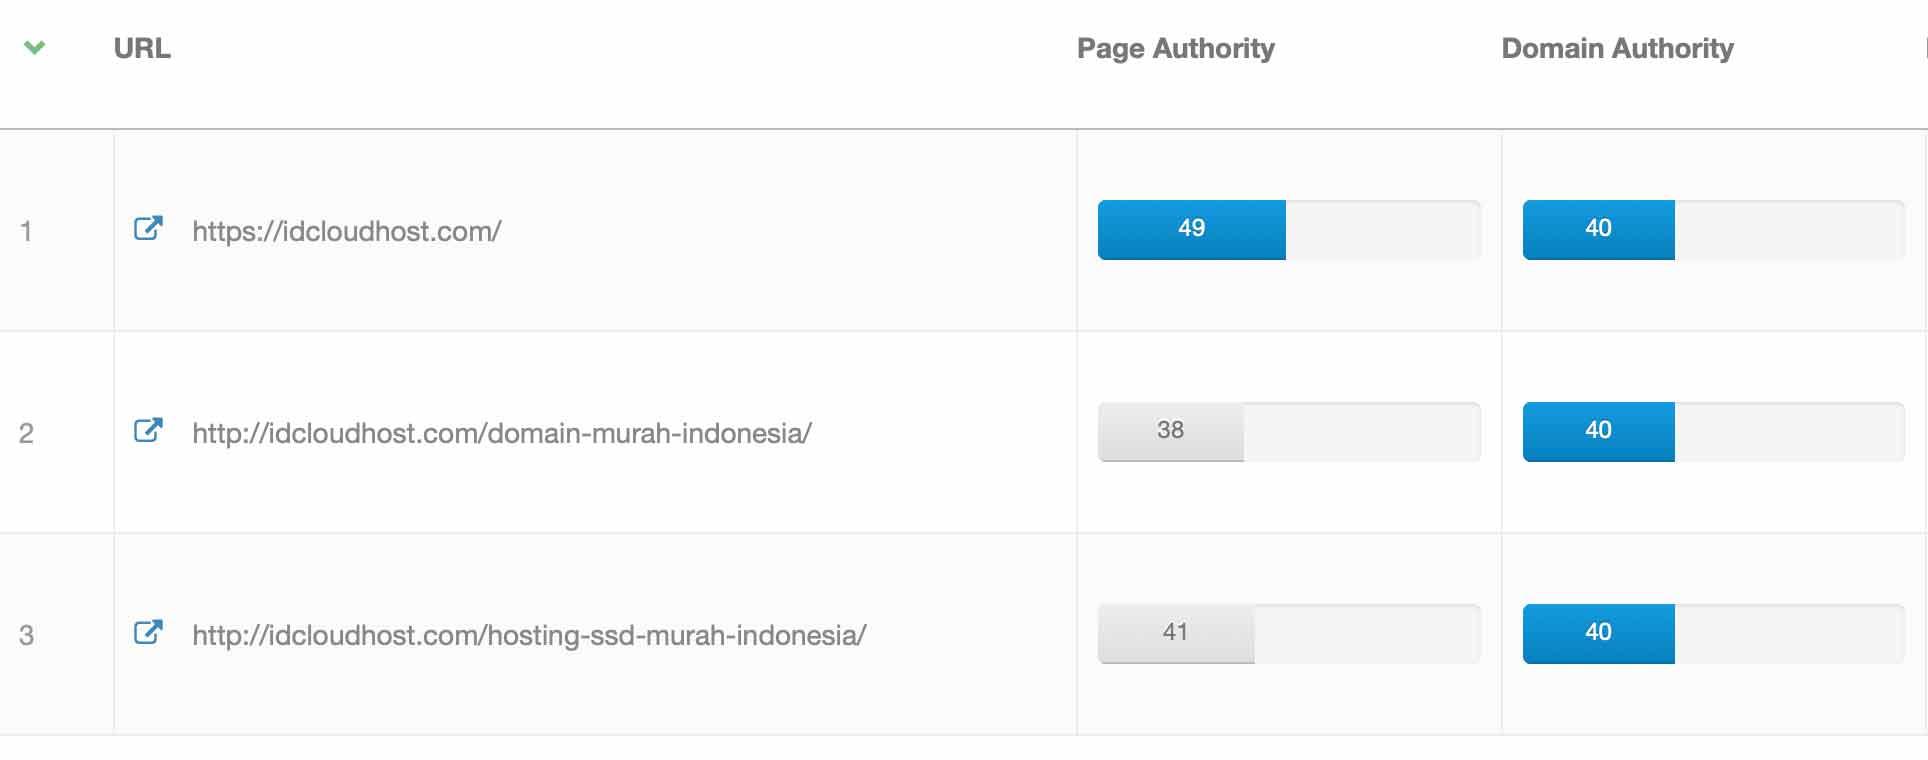 Panduan Lengkap Apa itu Domain Authority dan Page Authority ...